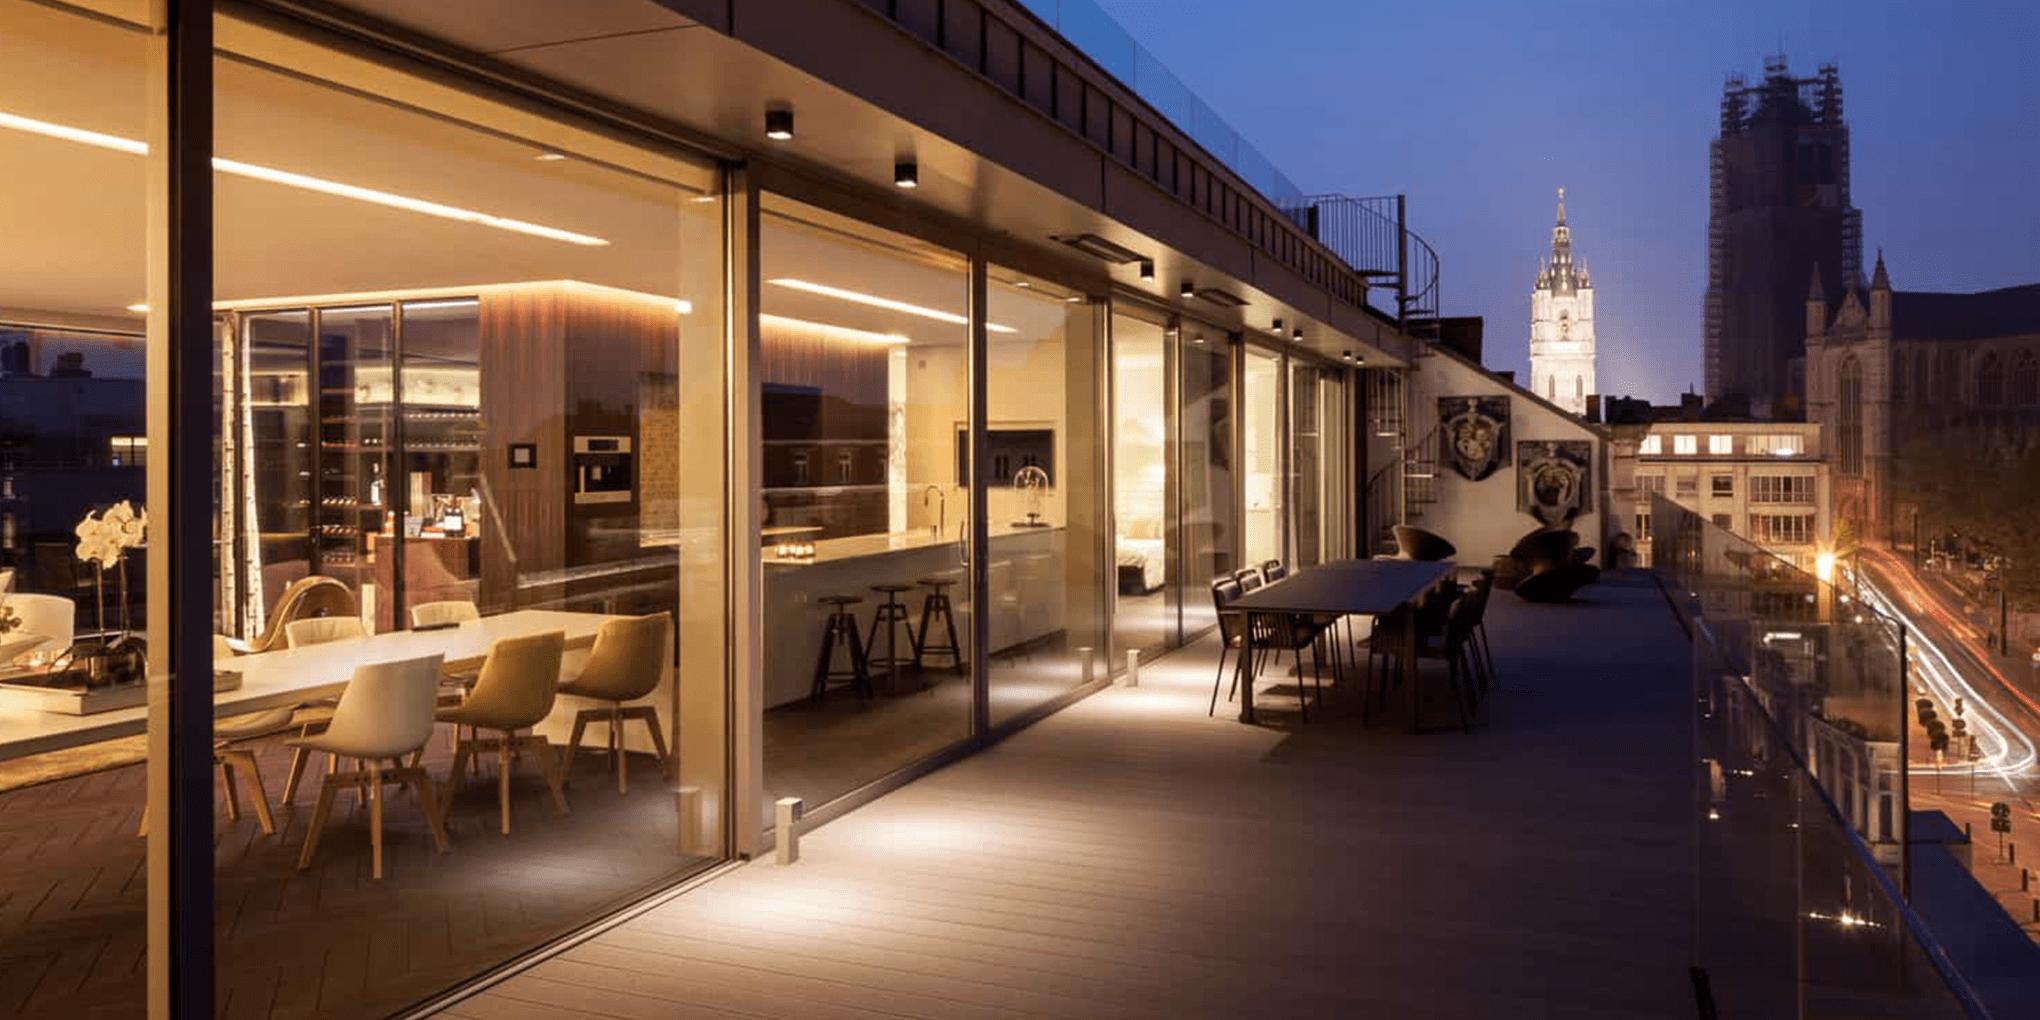 paris night | Baeyens & Beck architecten Gent | architect nieuwbouw renovatie interieur | high end | architectenbureau